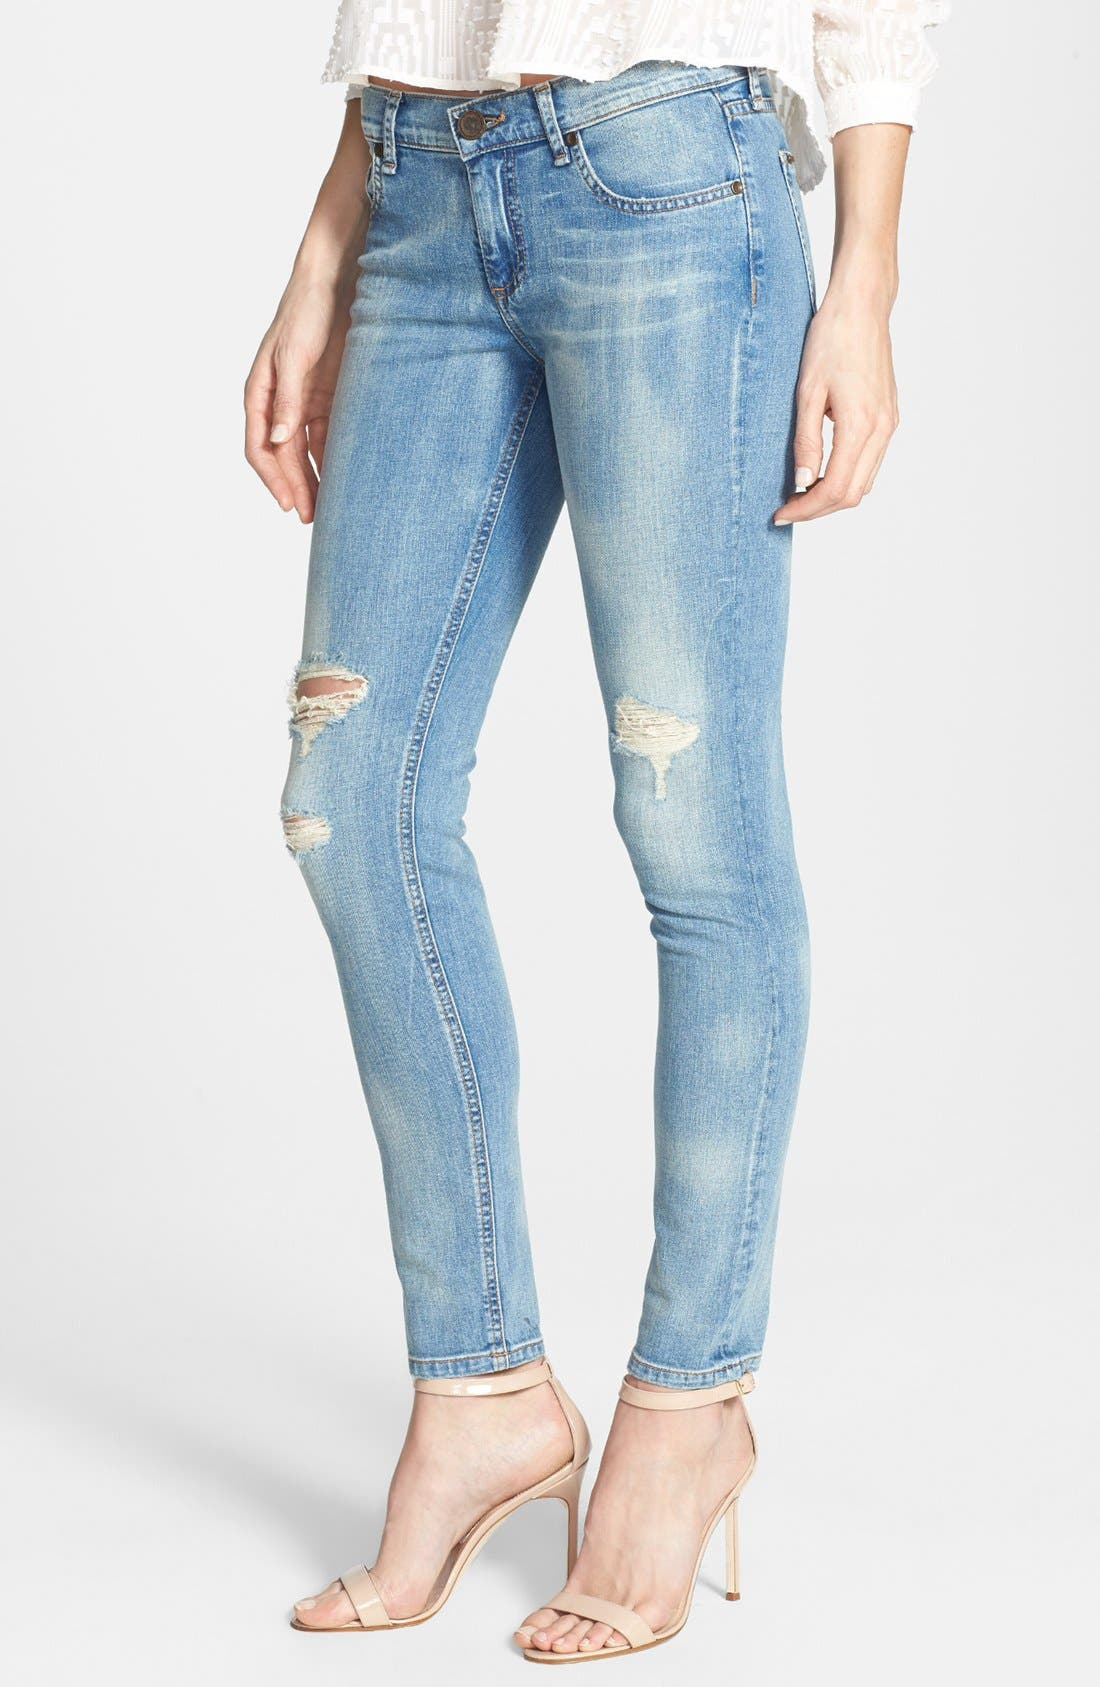 Main Image - edyson 'Sloan' Destroyed Skinny Jeans (Marmi)